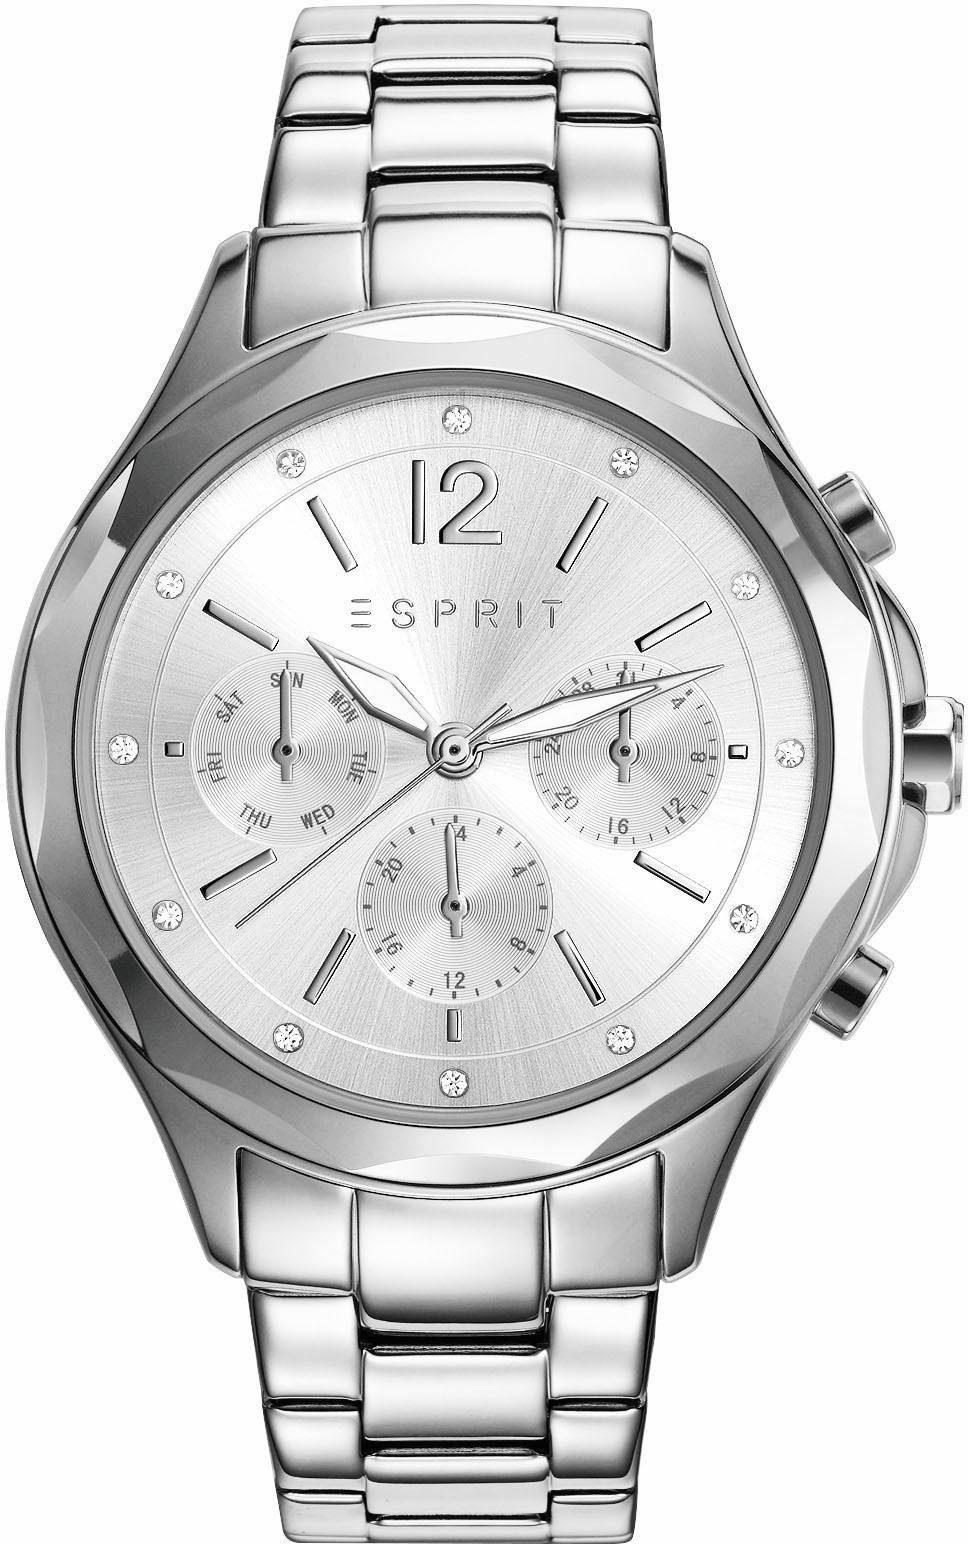 Esprit Multifunktionsuhr »ESPRIT-TP10924 SILVER, ES109242001«